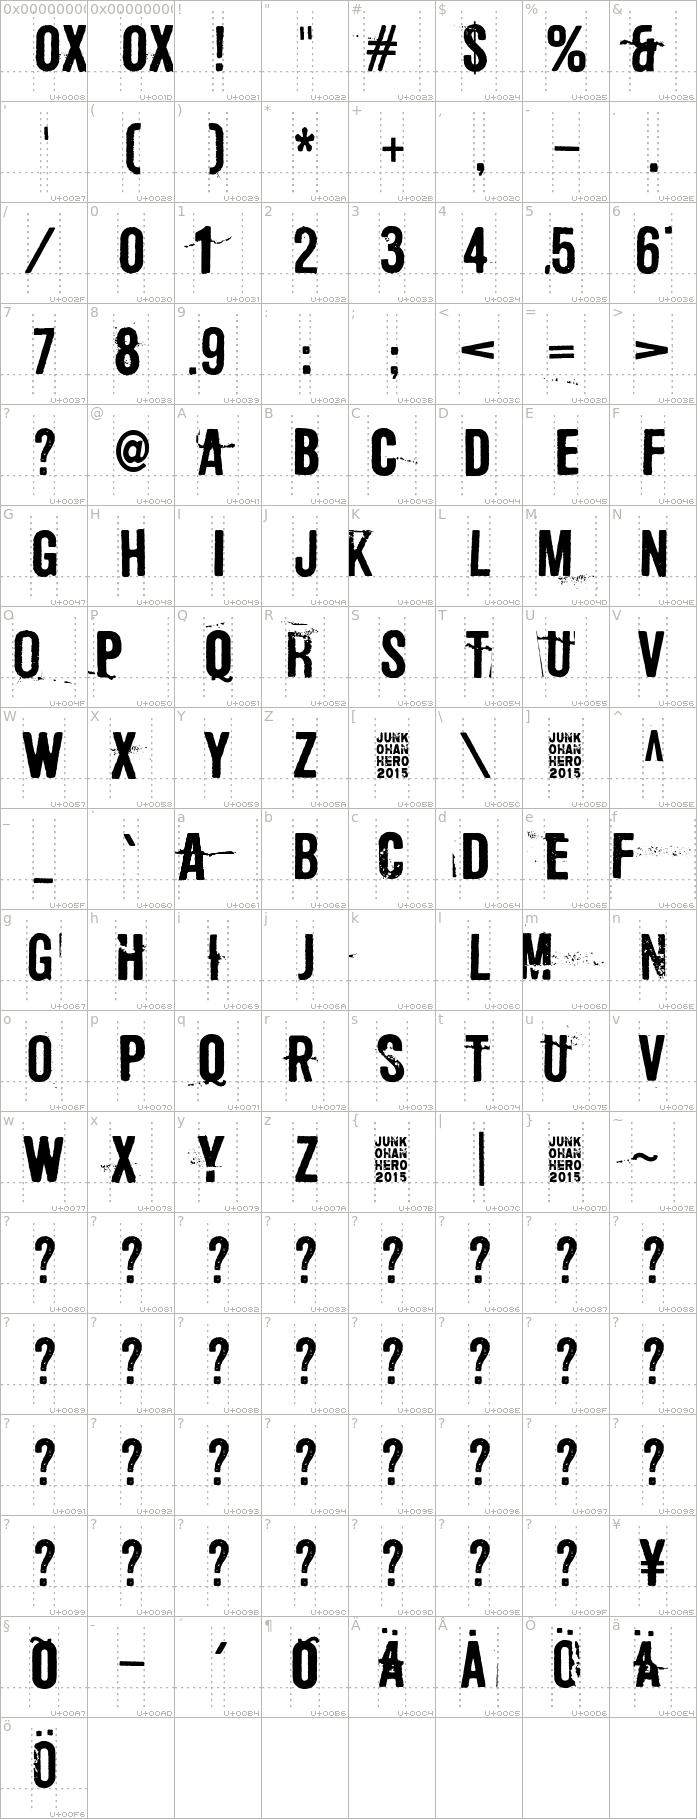 sonic-barrier.regular.character-map-1